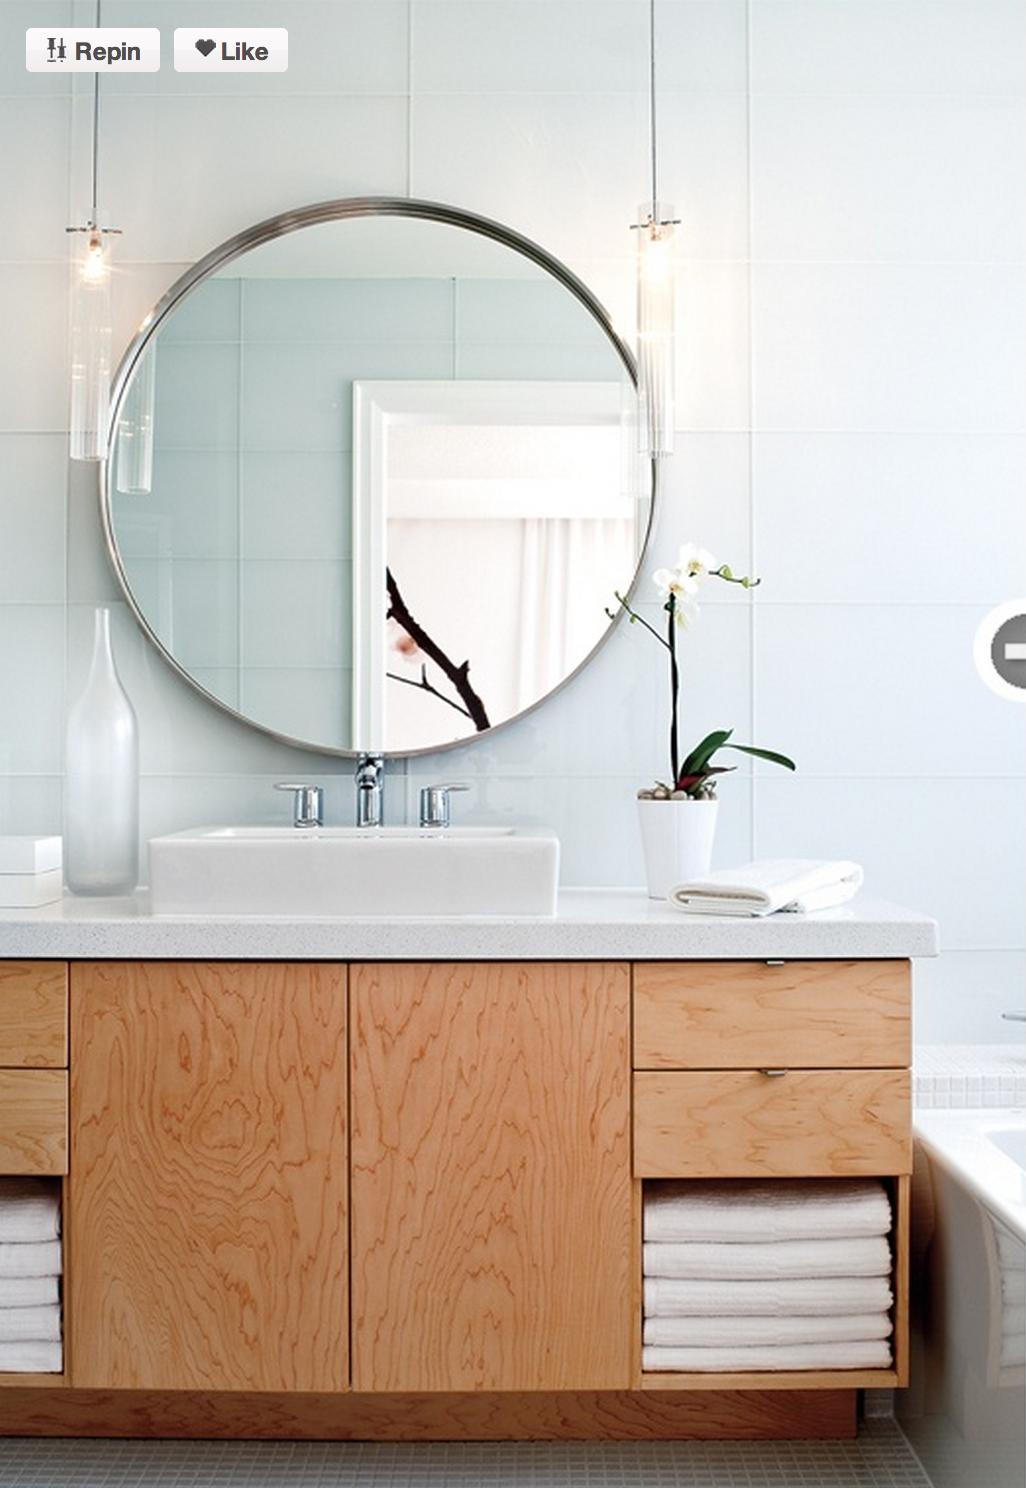 Pin by sofía corredoira on bathroom pinterest bath small shower